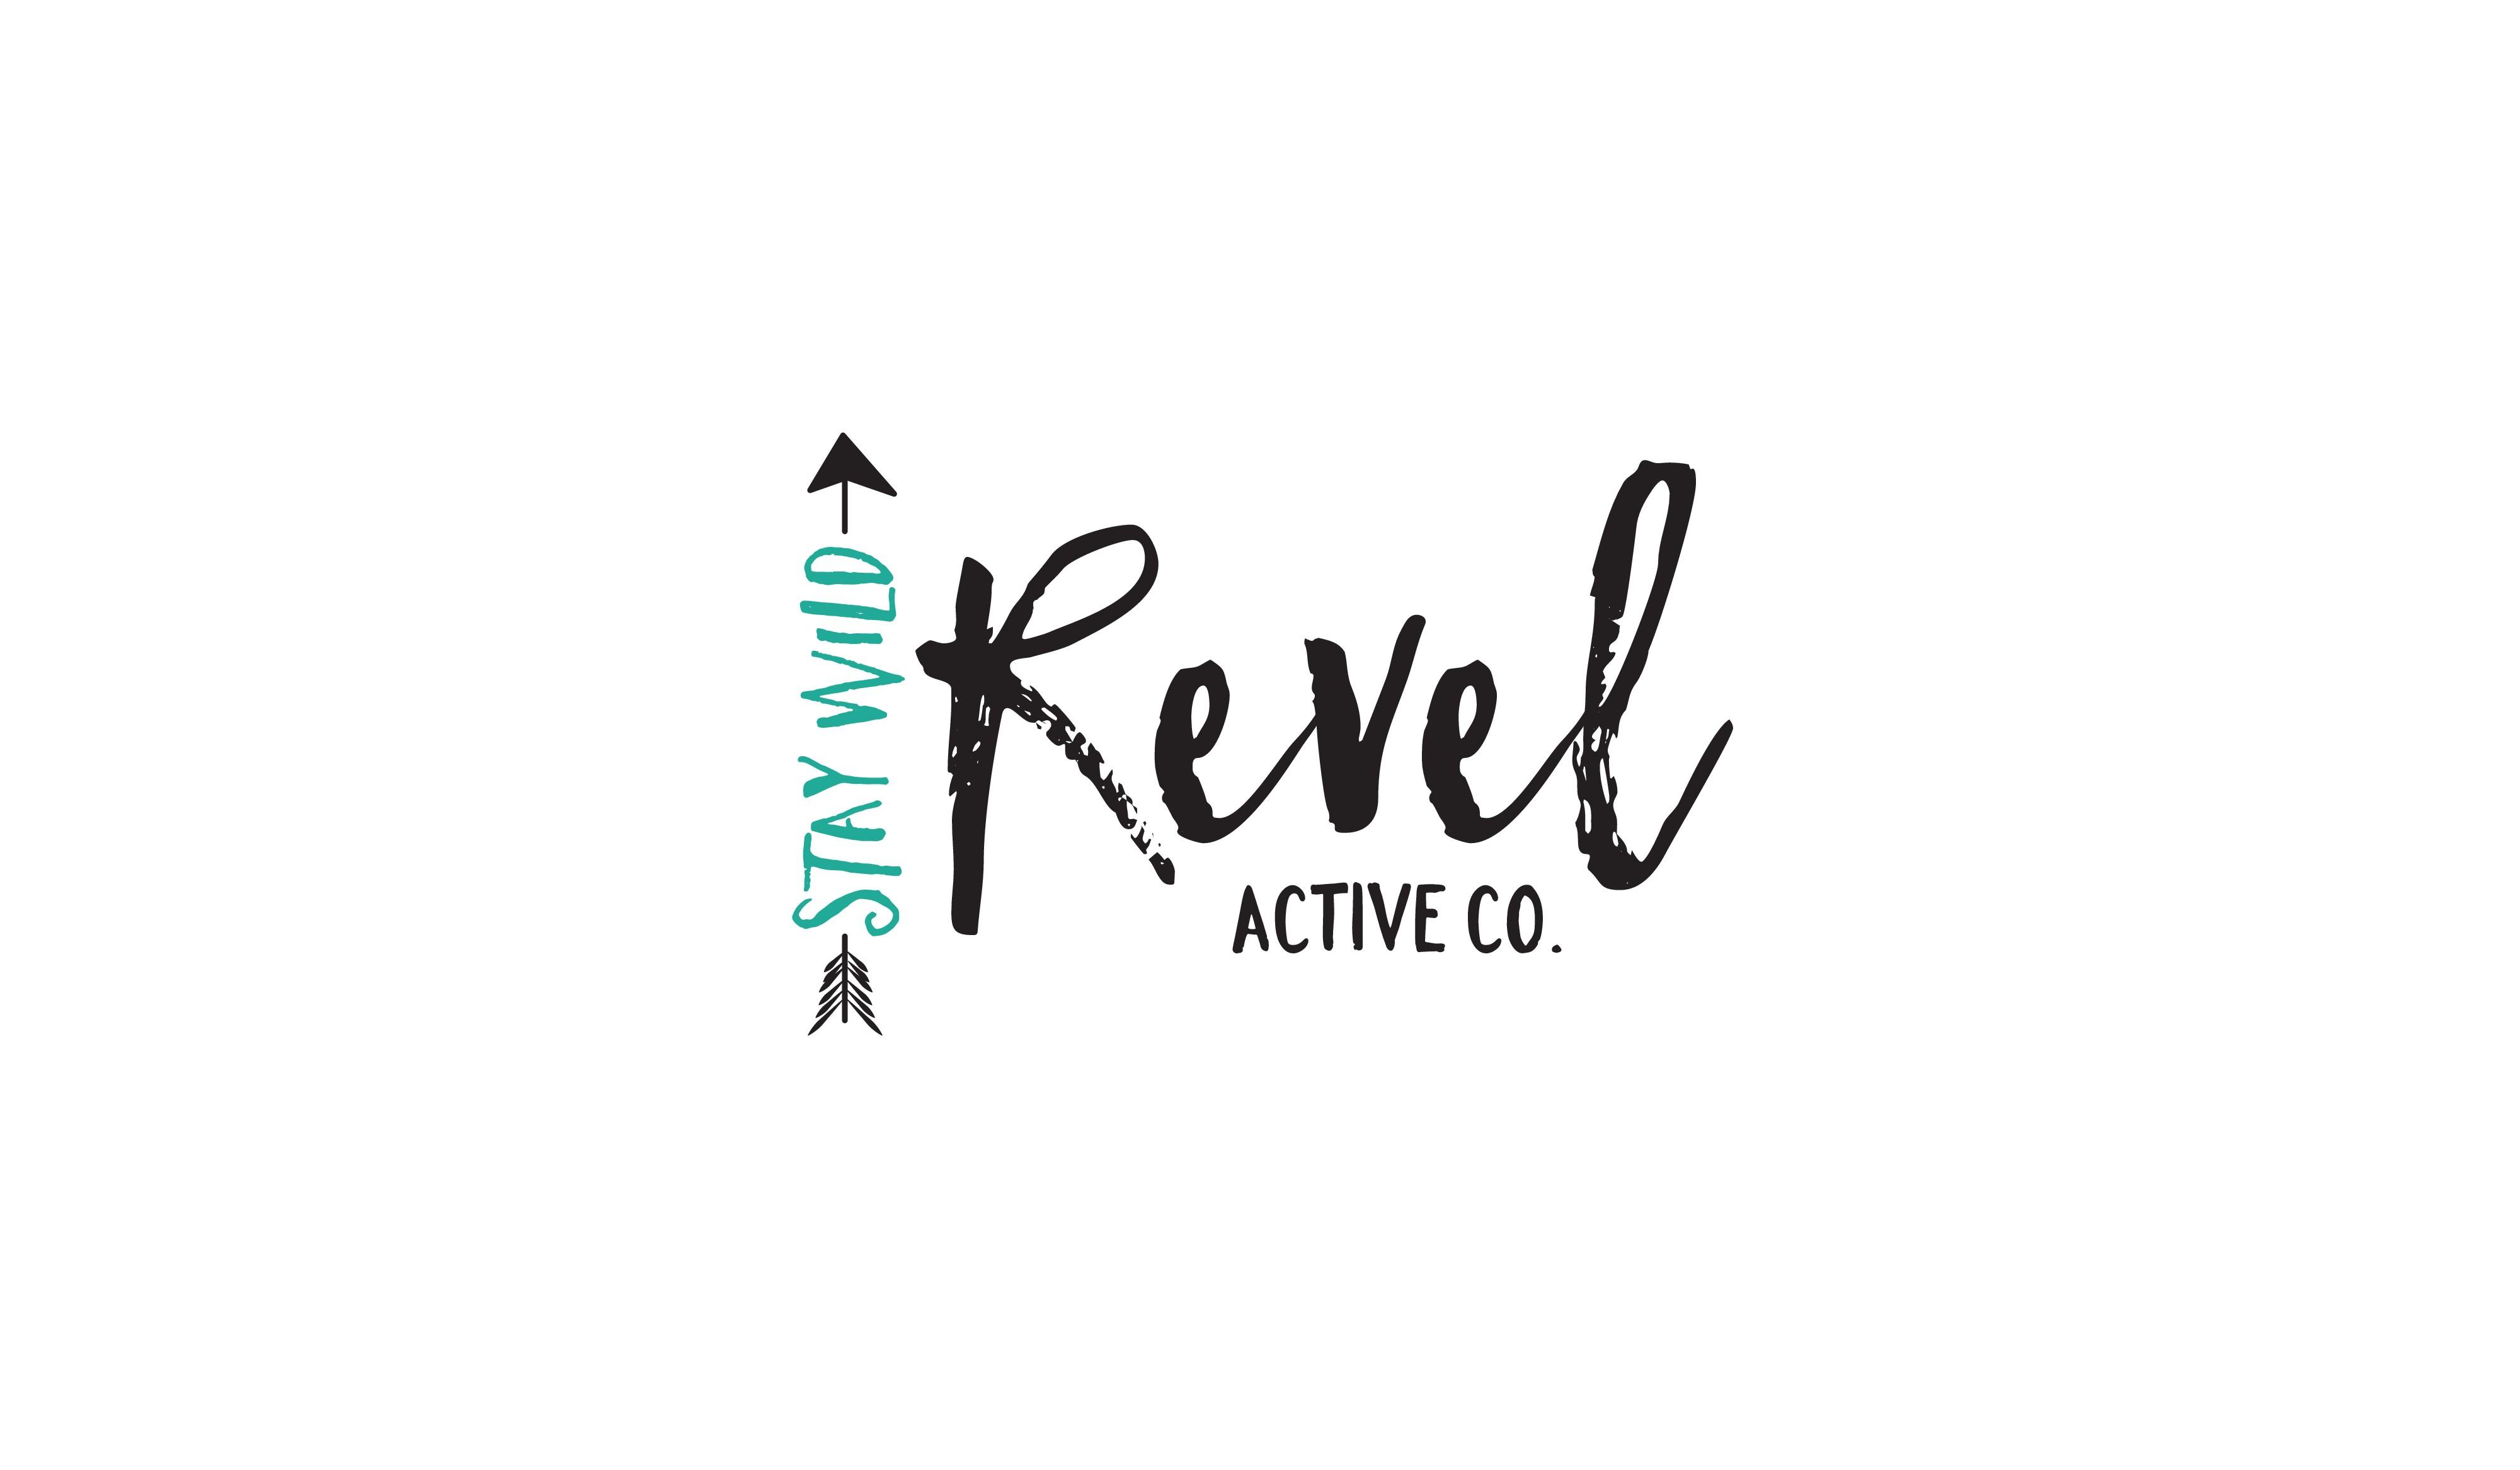 Swimwear/surf logo & website design